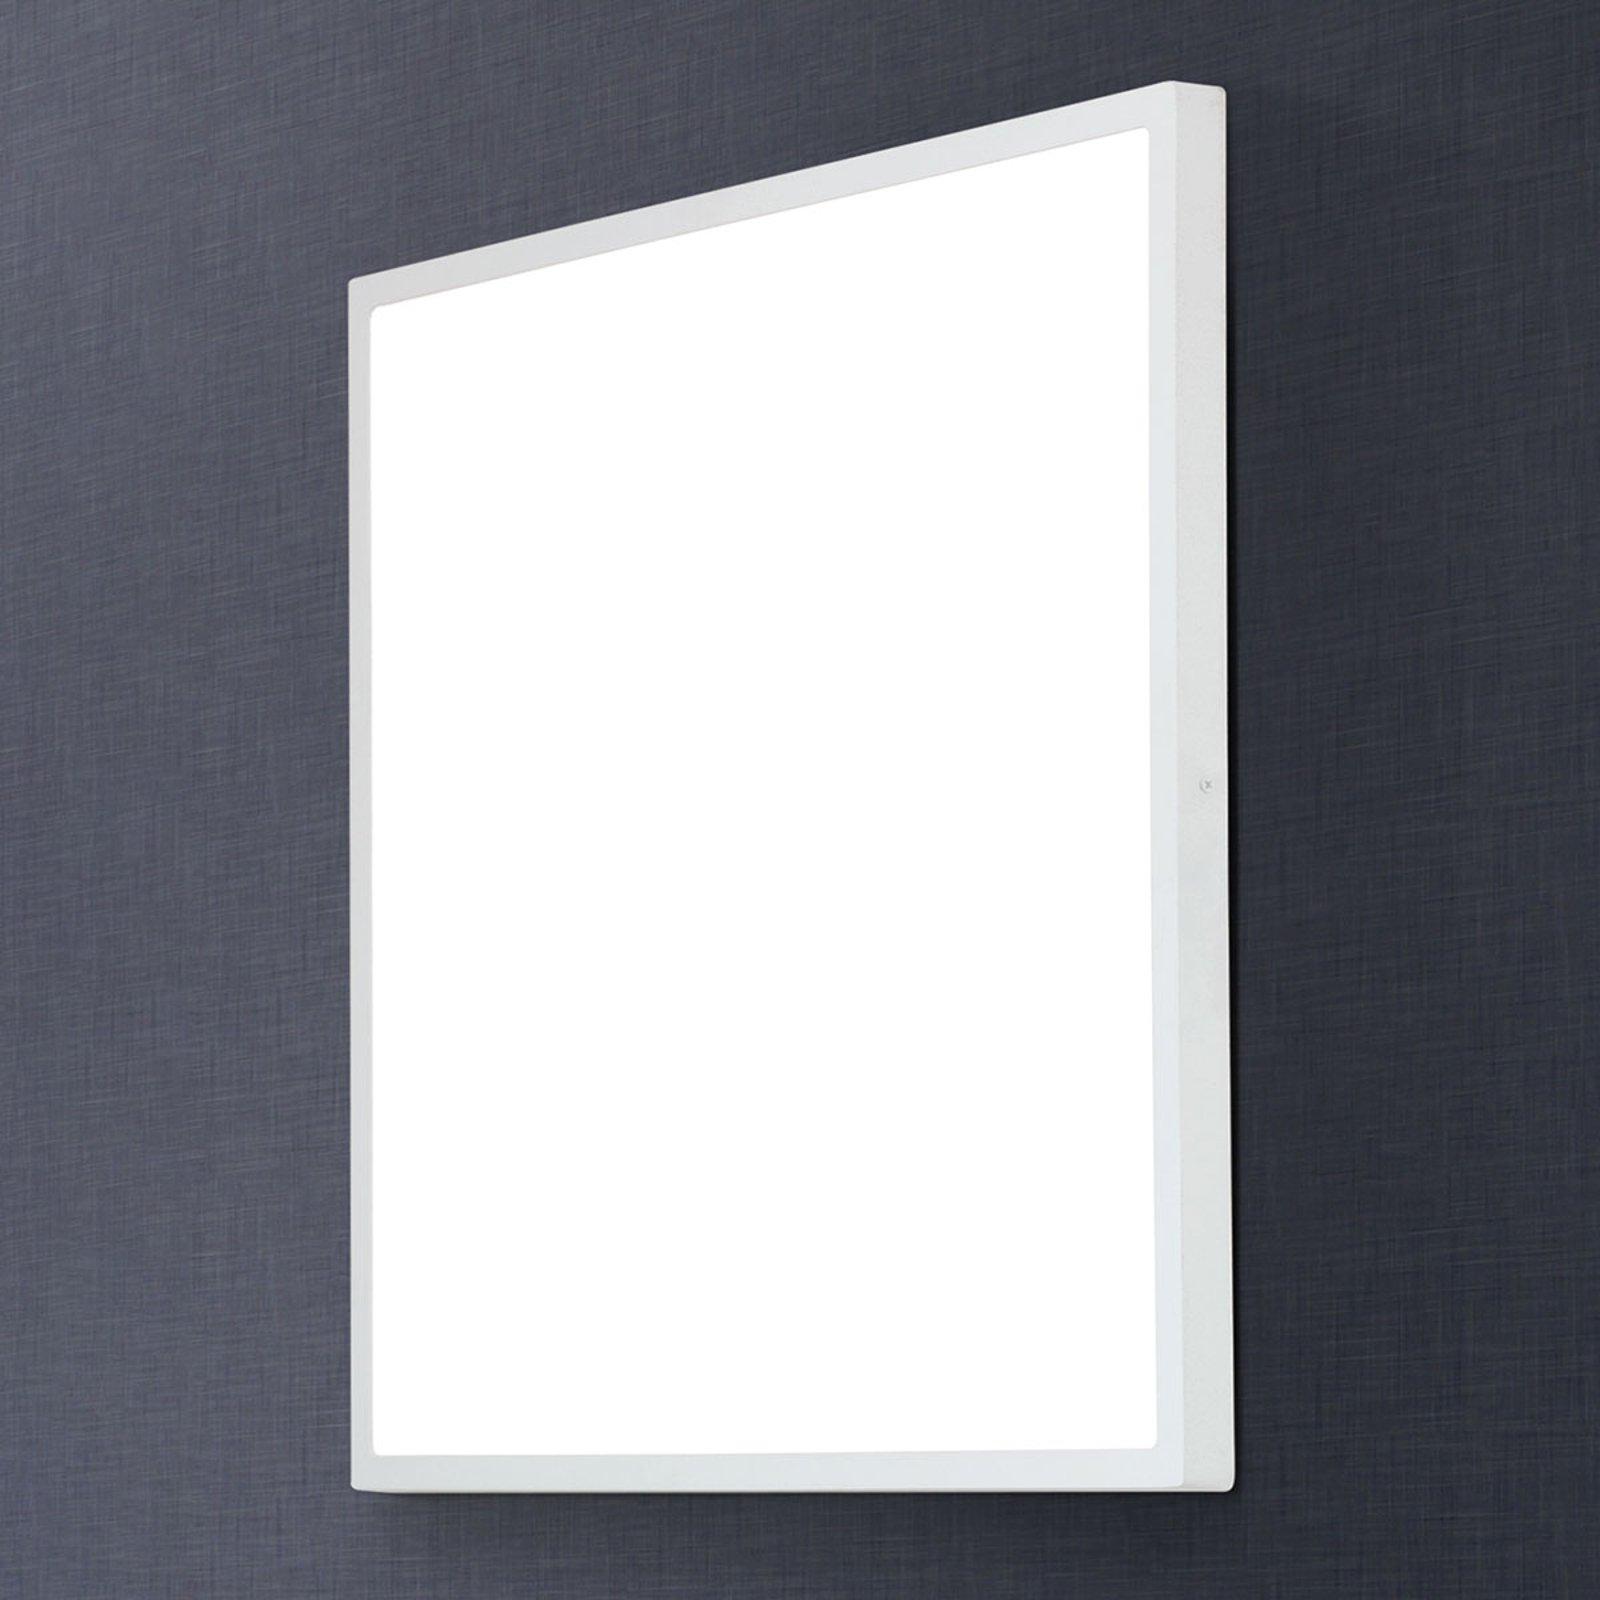 Kantet LED-taklampe Lero - 60 x 60 cm